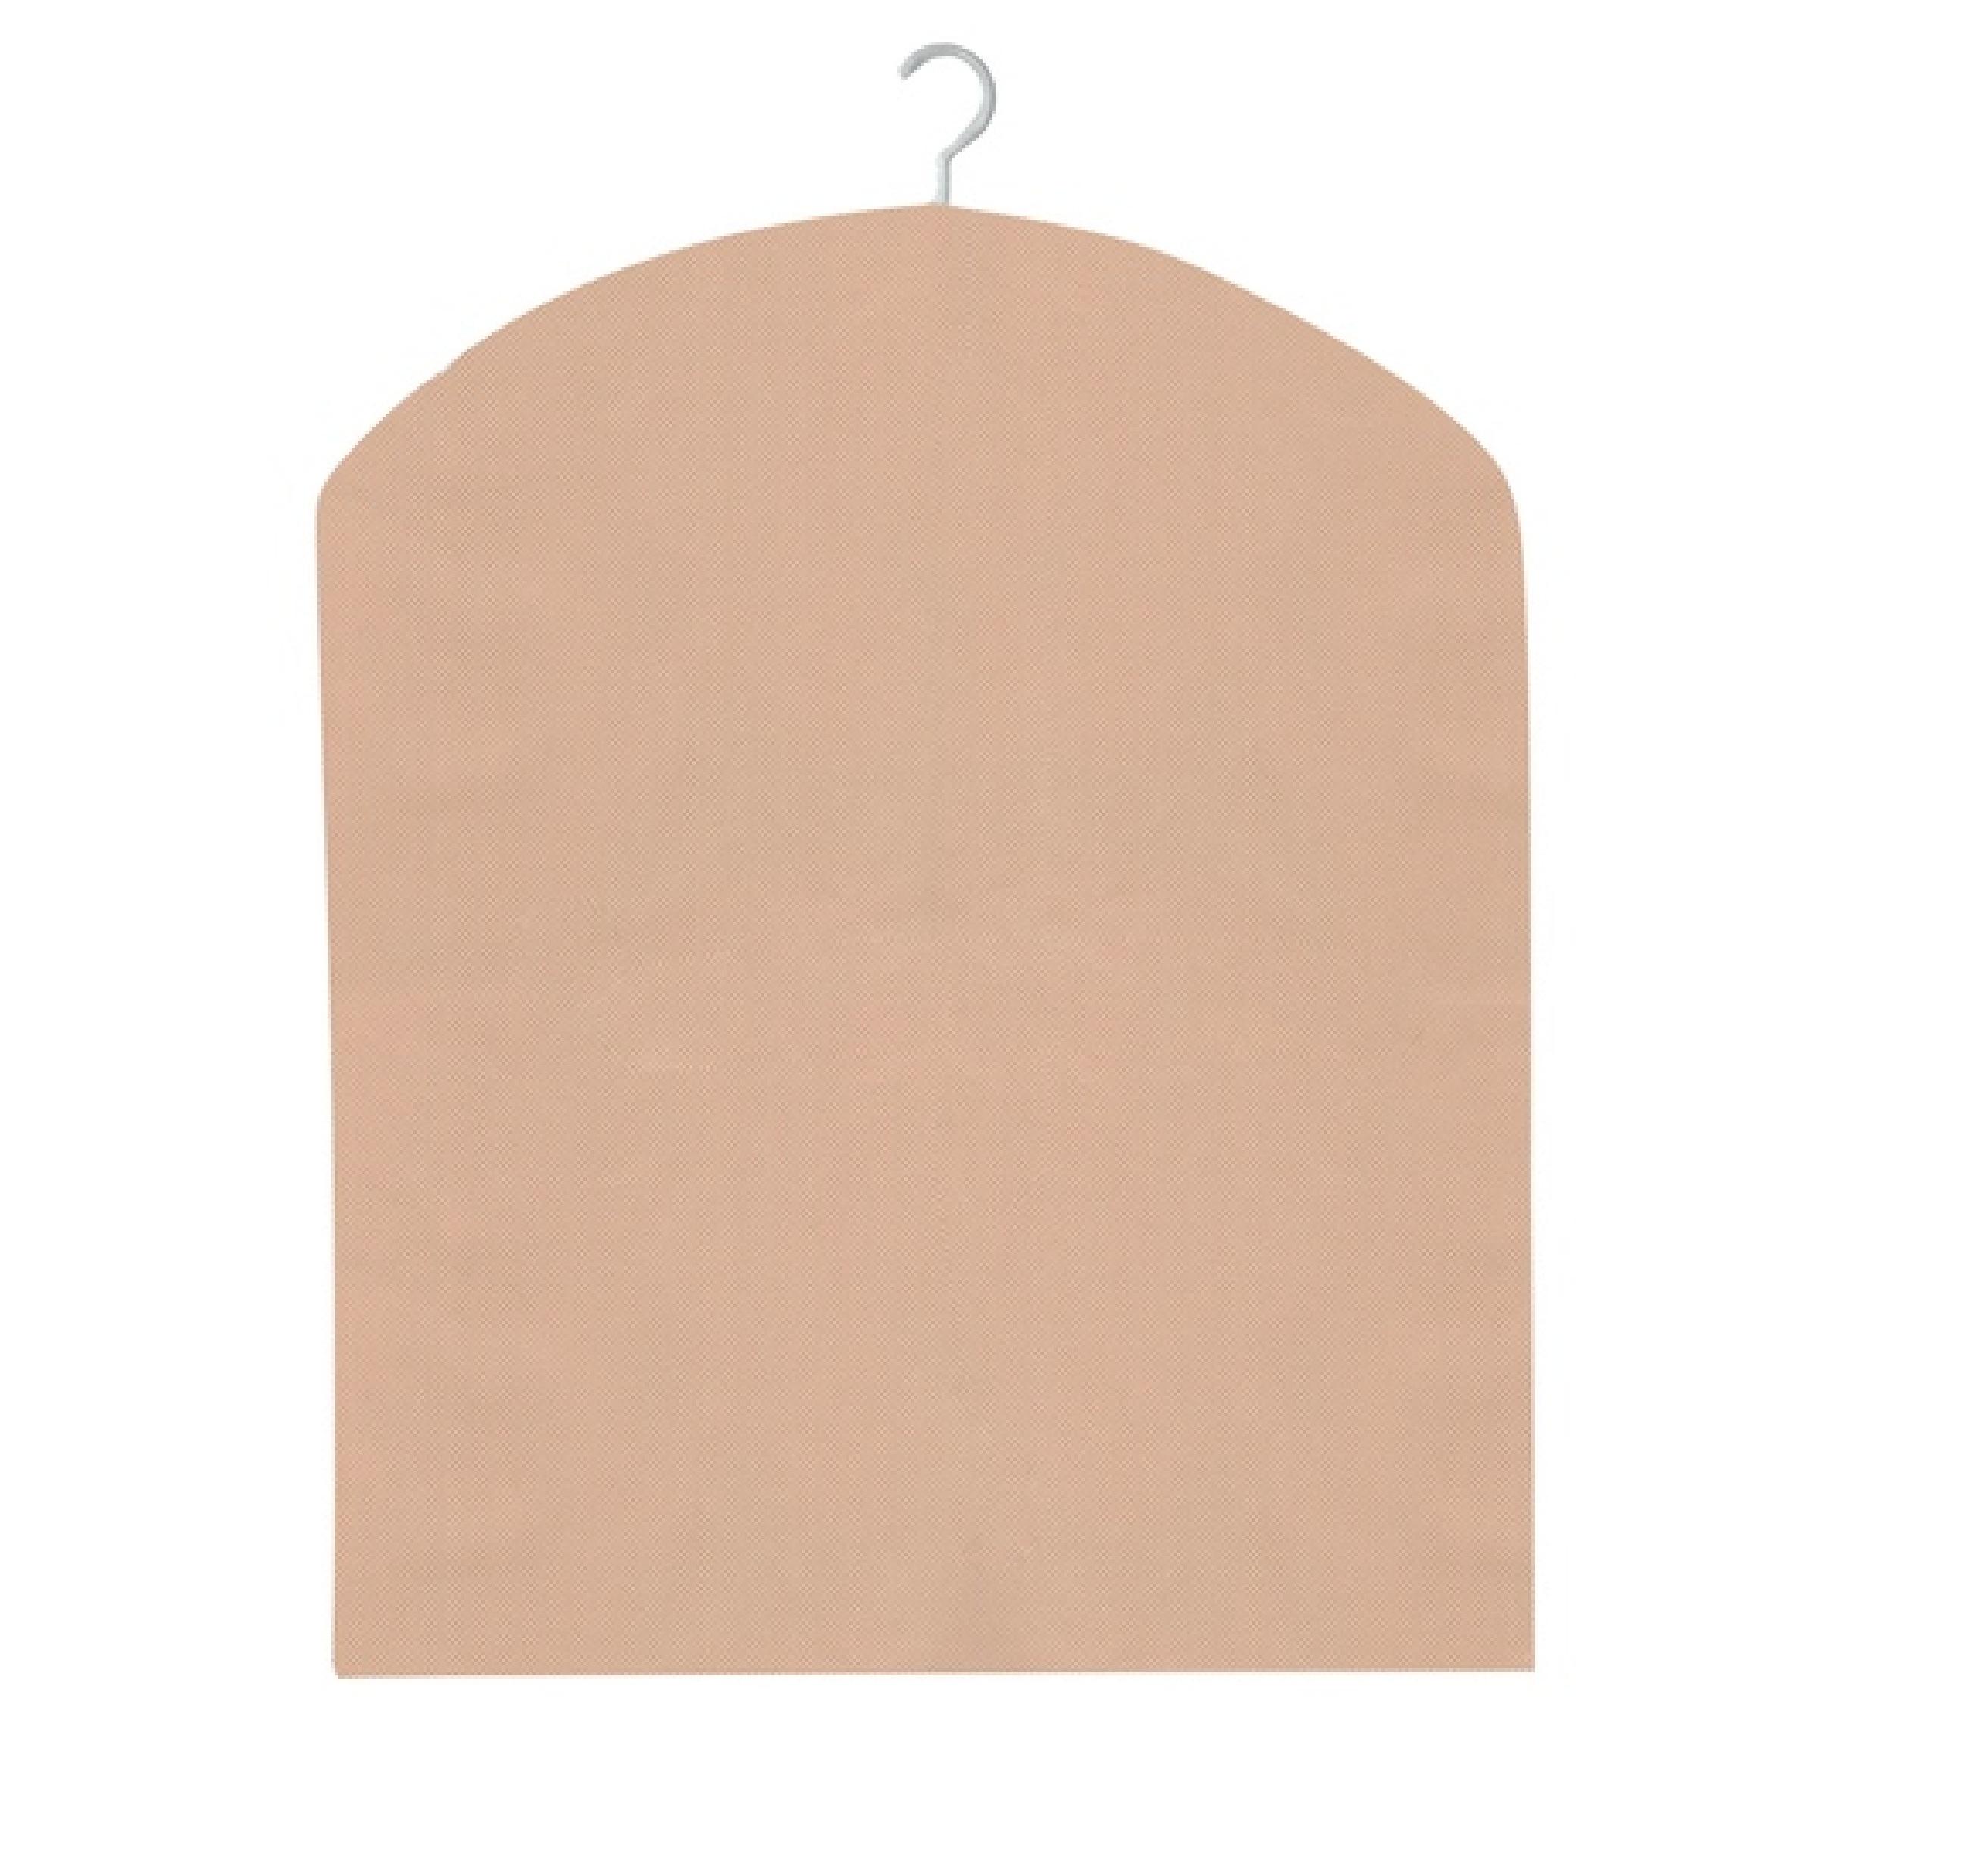 HausFrau Чехол для одежды 65х80 см нетканый